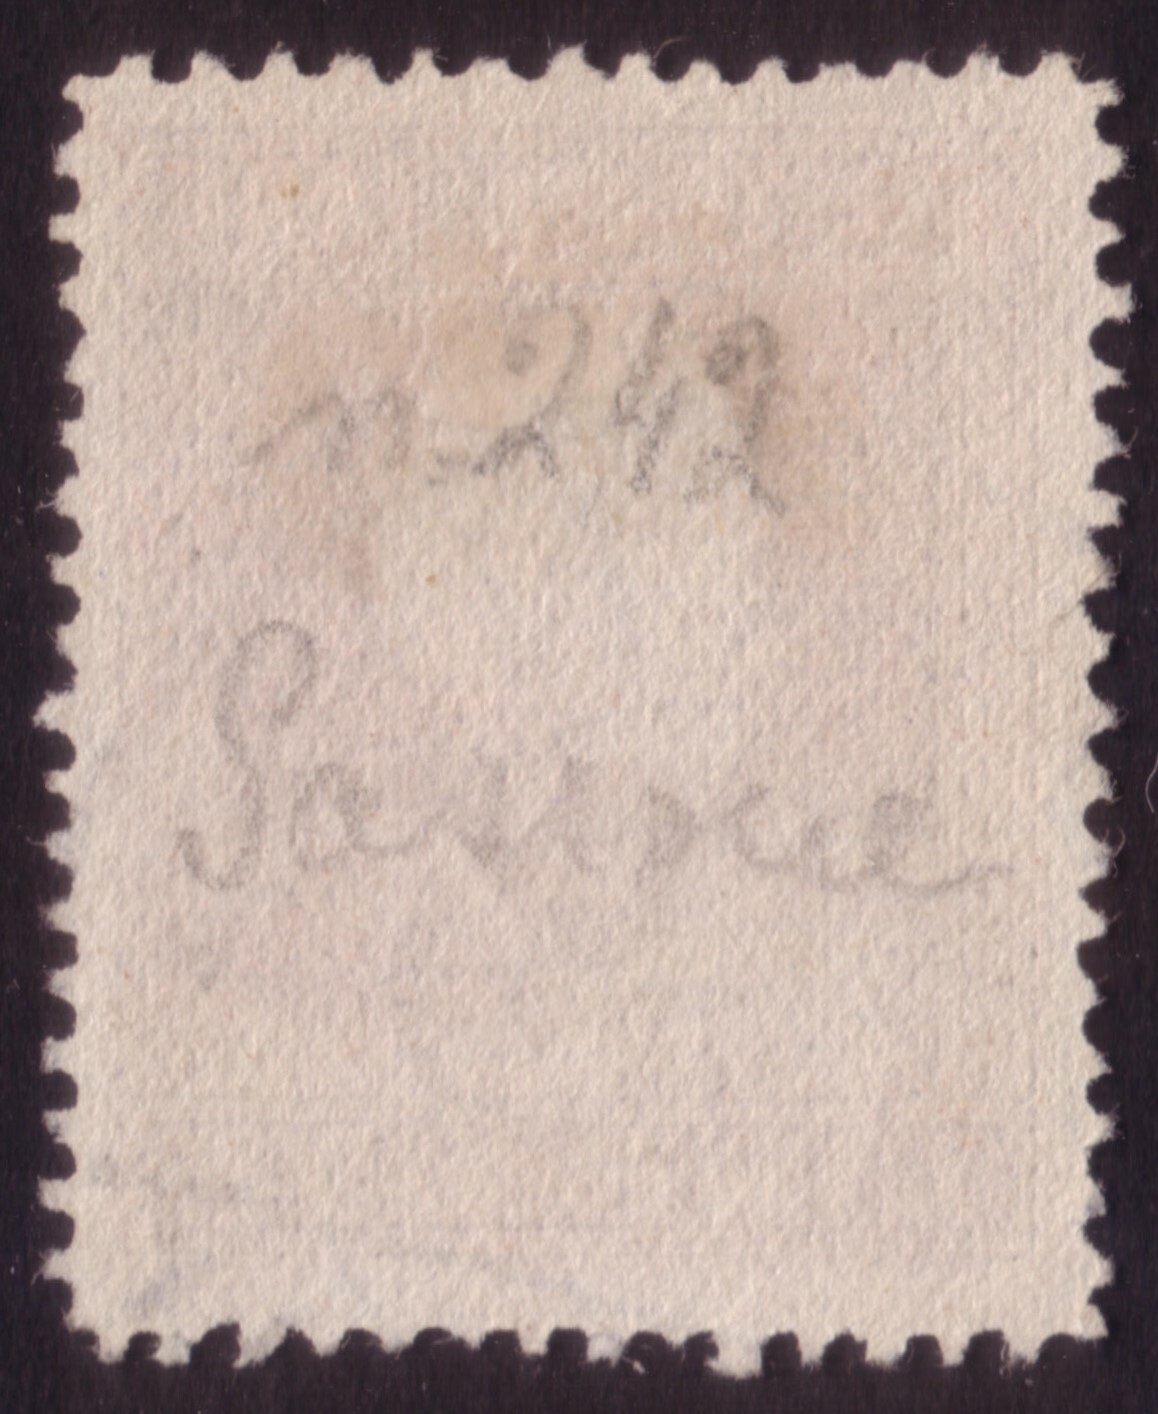 Lot 2419 - REGNO D'ITALIA Individual lots -  Ponte Auction House Stamps Auction 505